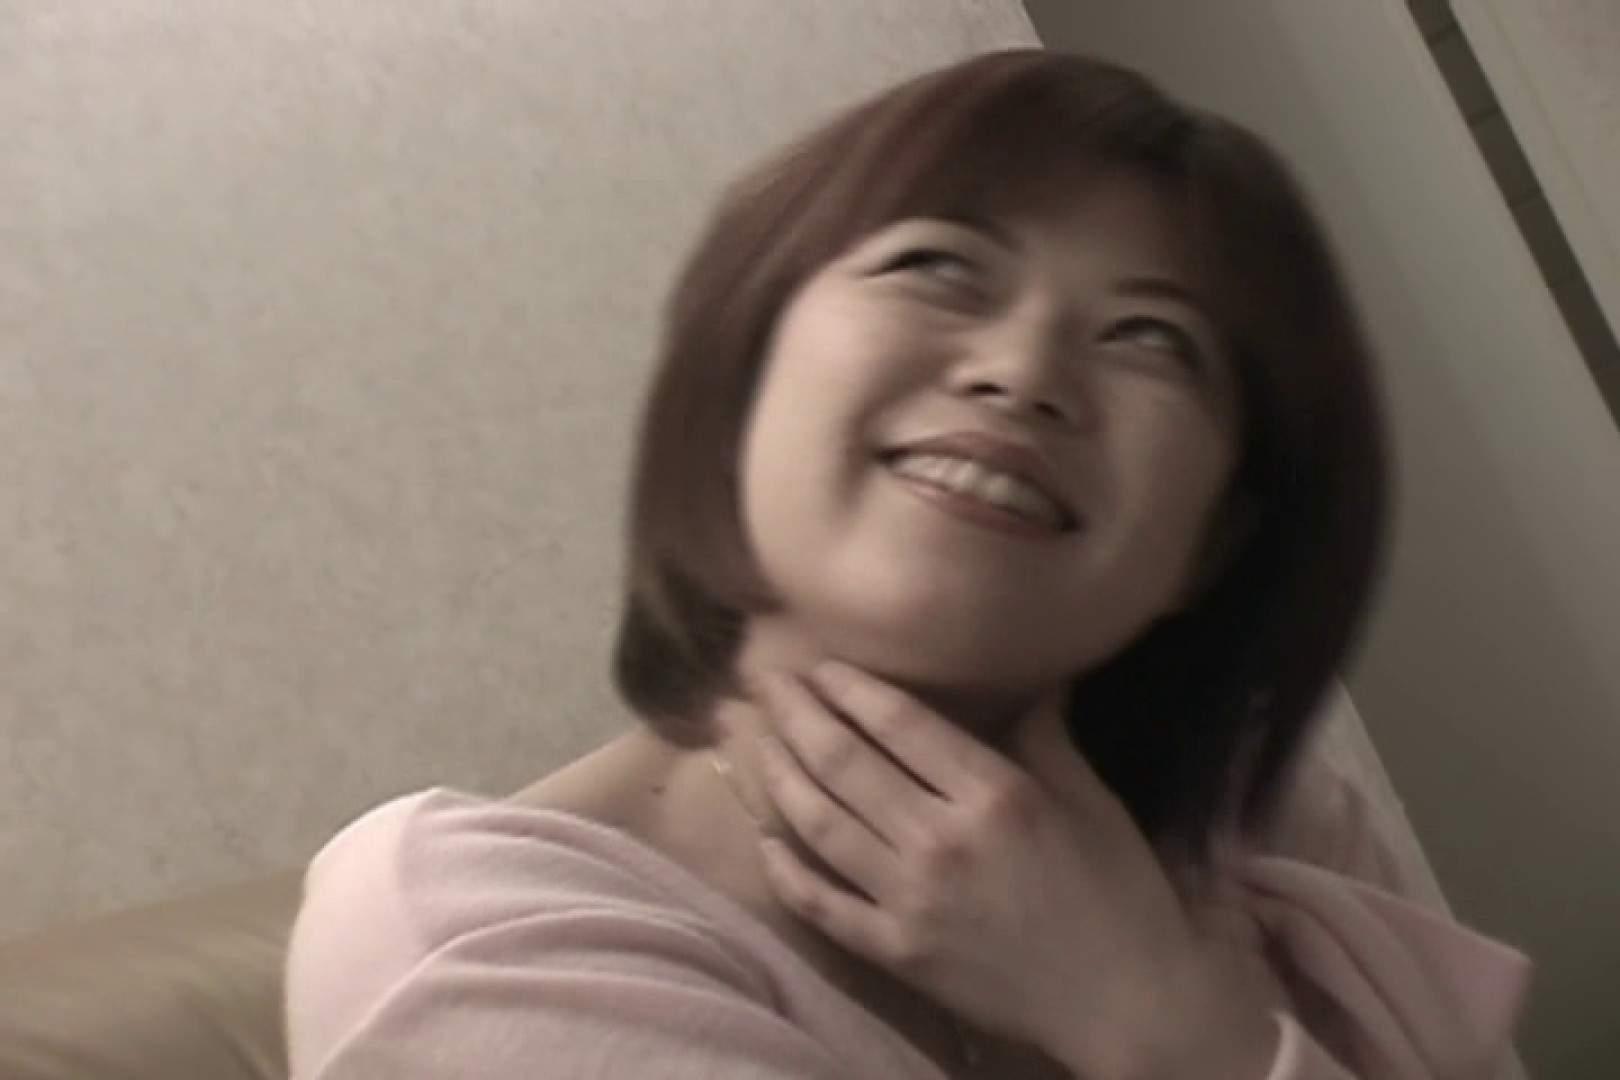 Hするために生まれてきたようなイキまくりの極エロ人妻~小池ゆり~ 熟女  108連発 23